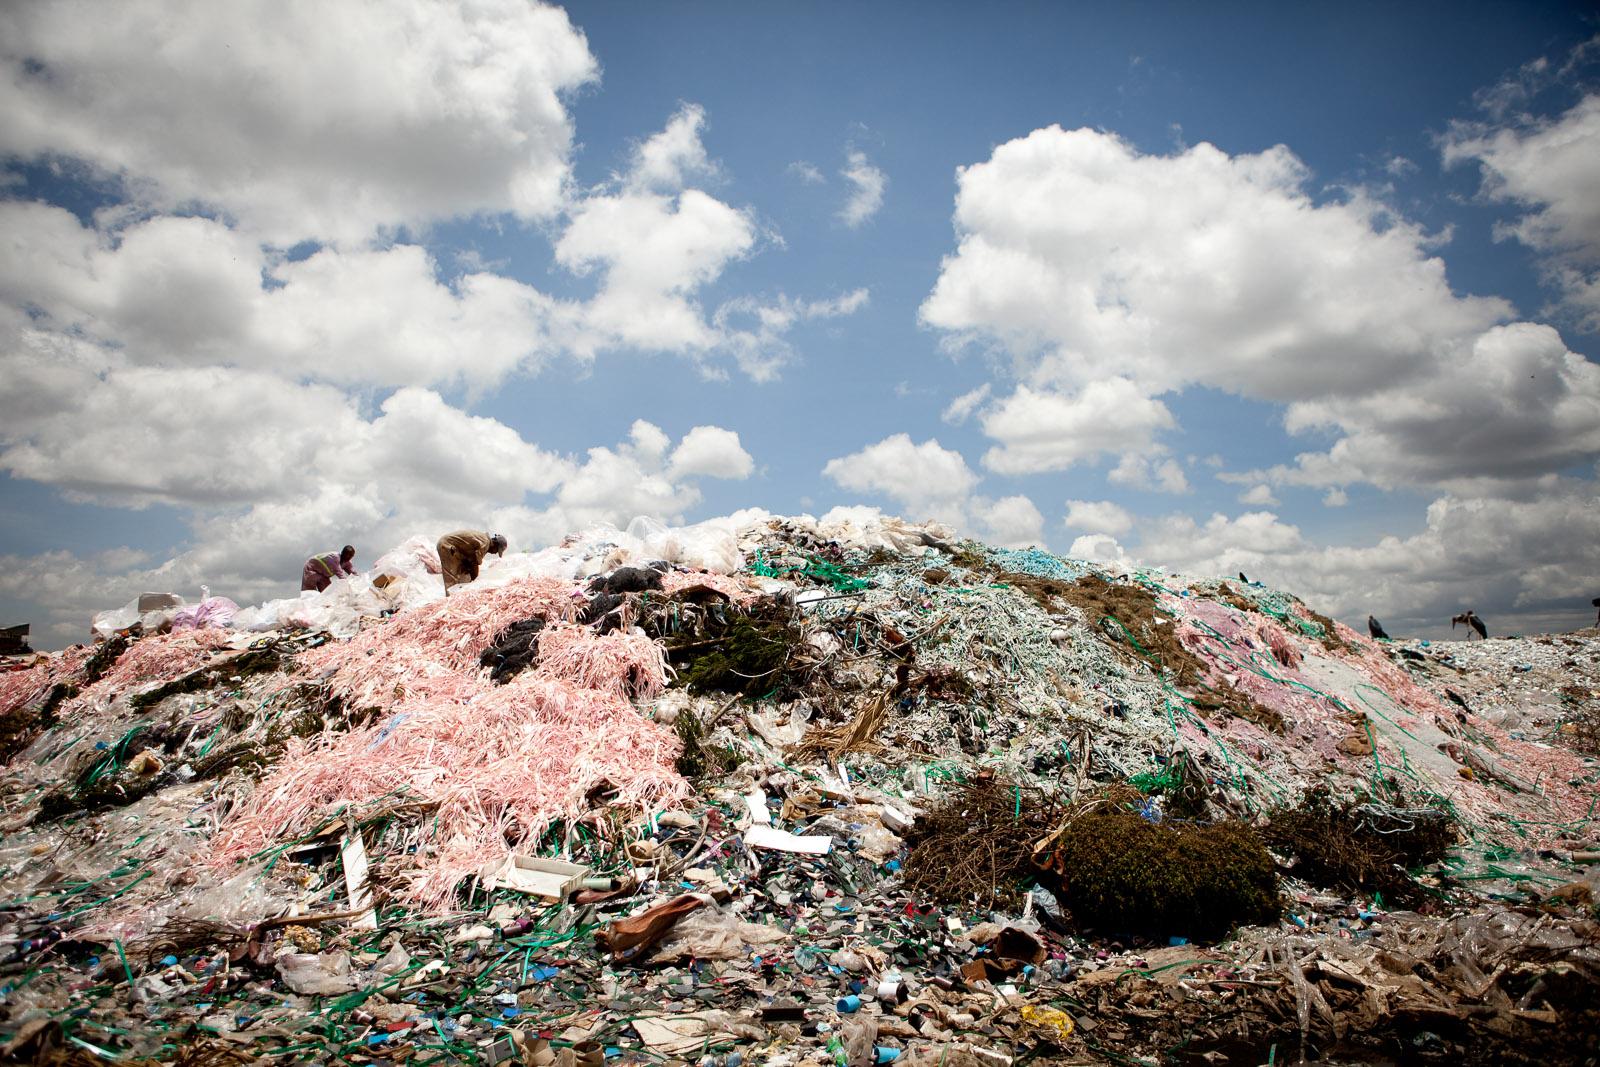 Recycling at the Dandora Dump, Korogocho, Nairobi, Kenya